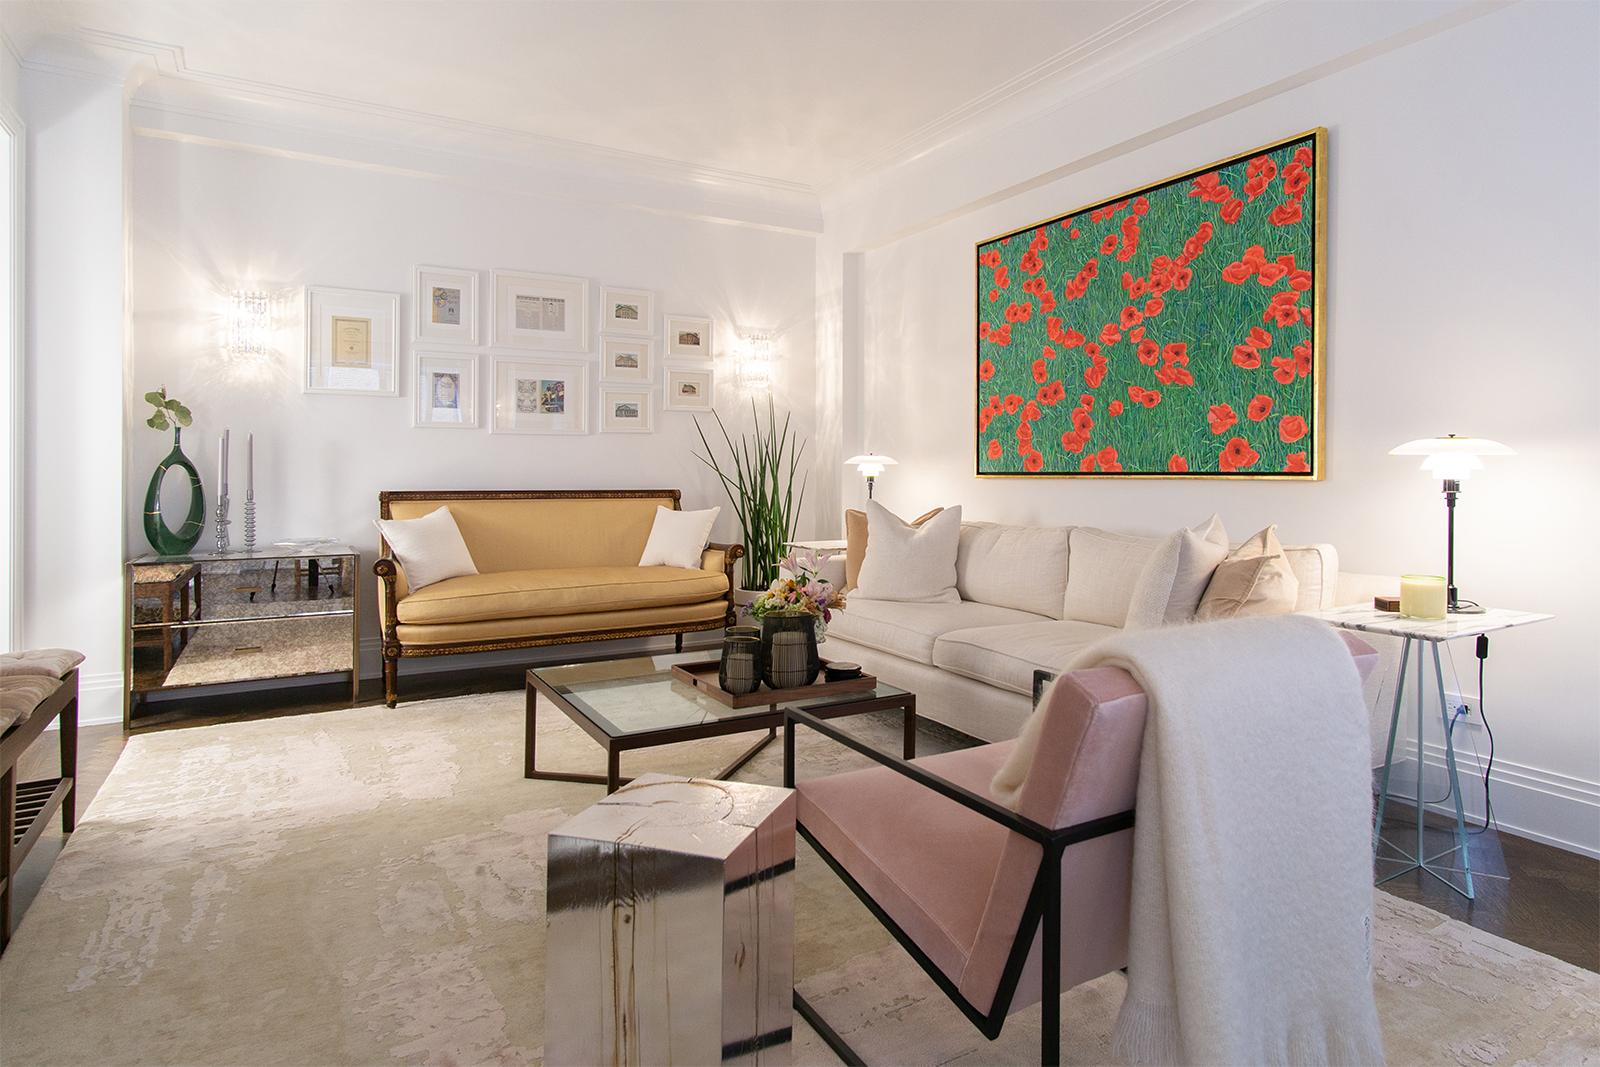 durodeco_Central Park Apartment (2).jpg